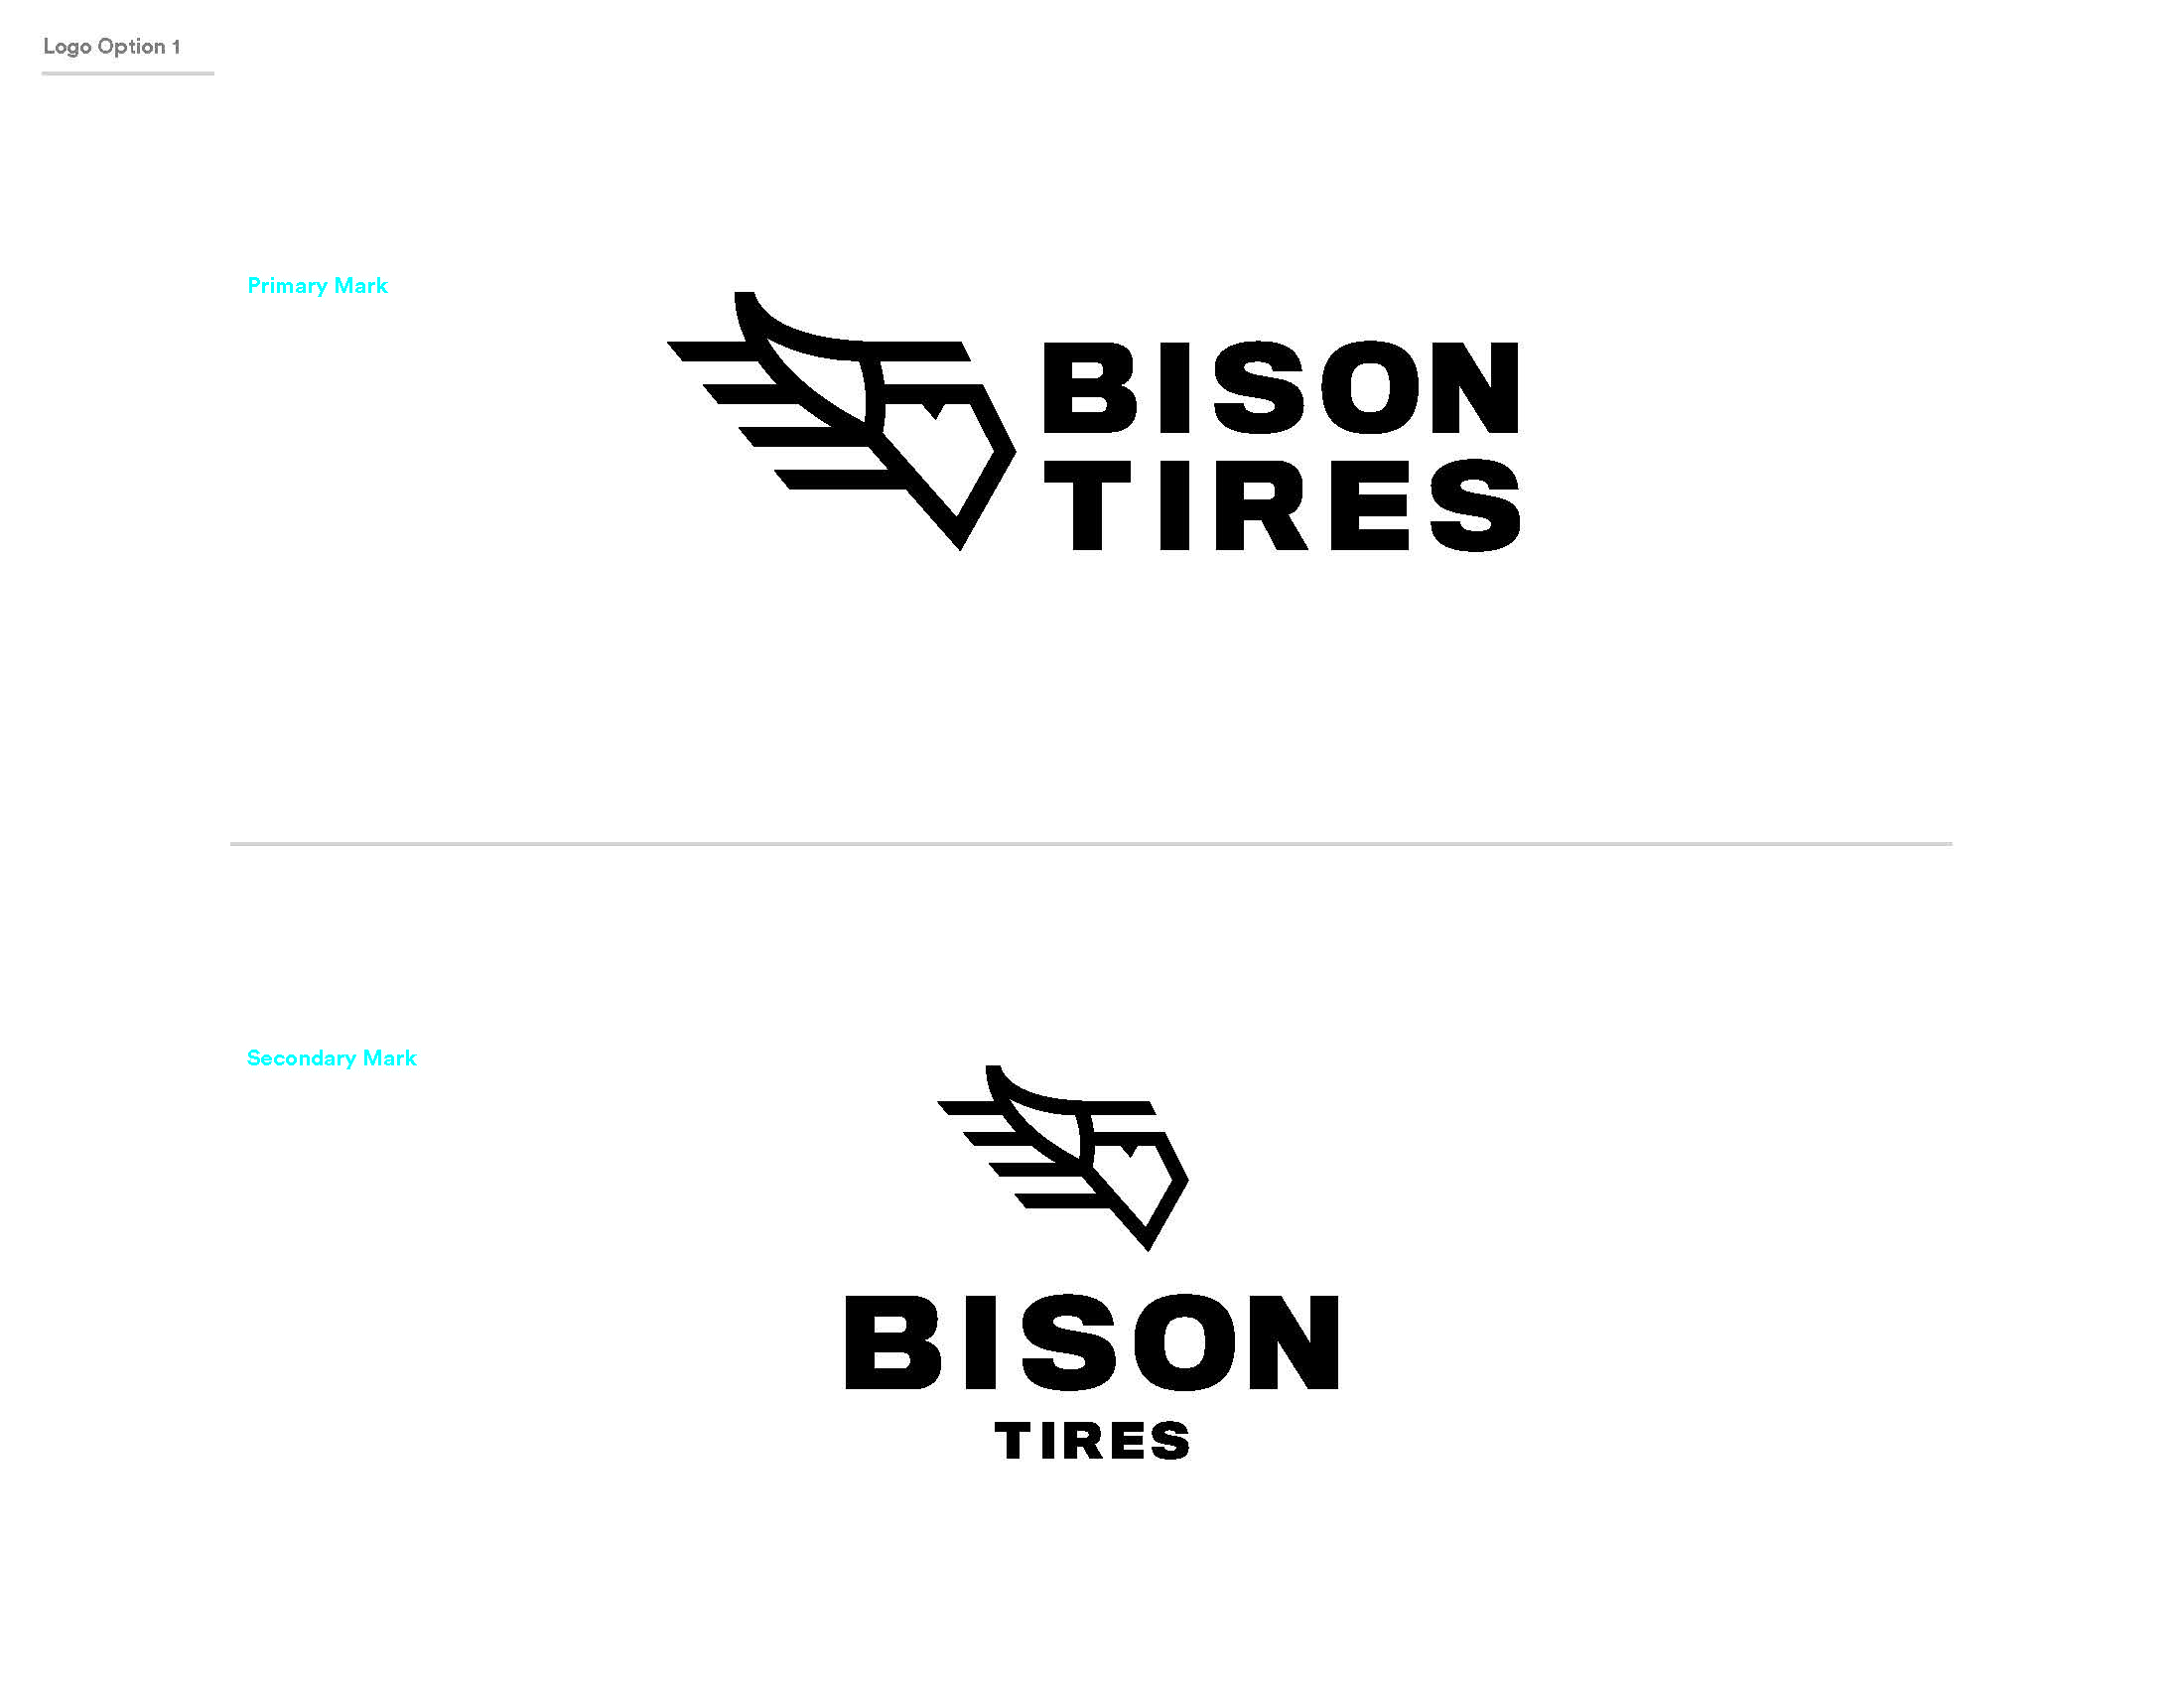 BisonTire_Working_Page_2.jpg